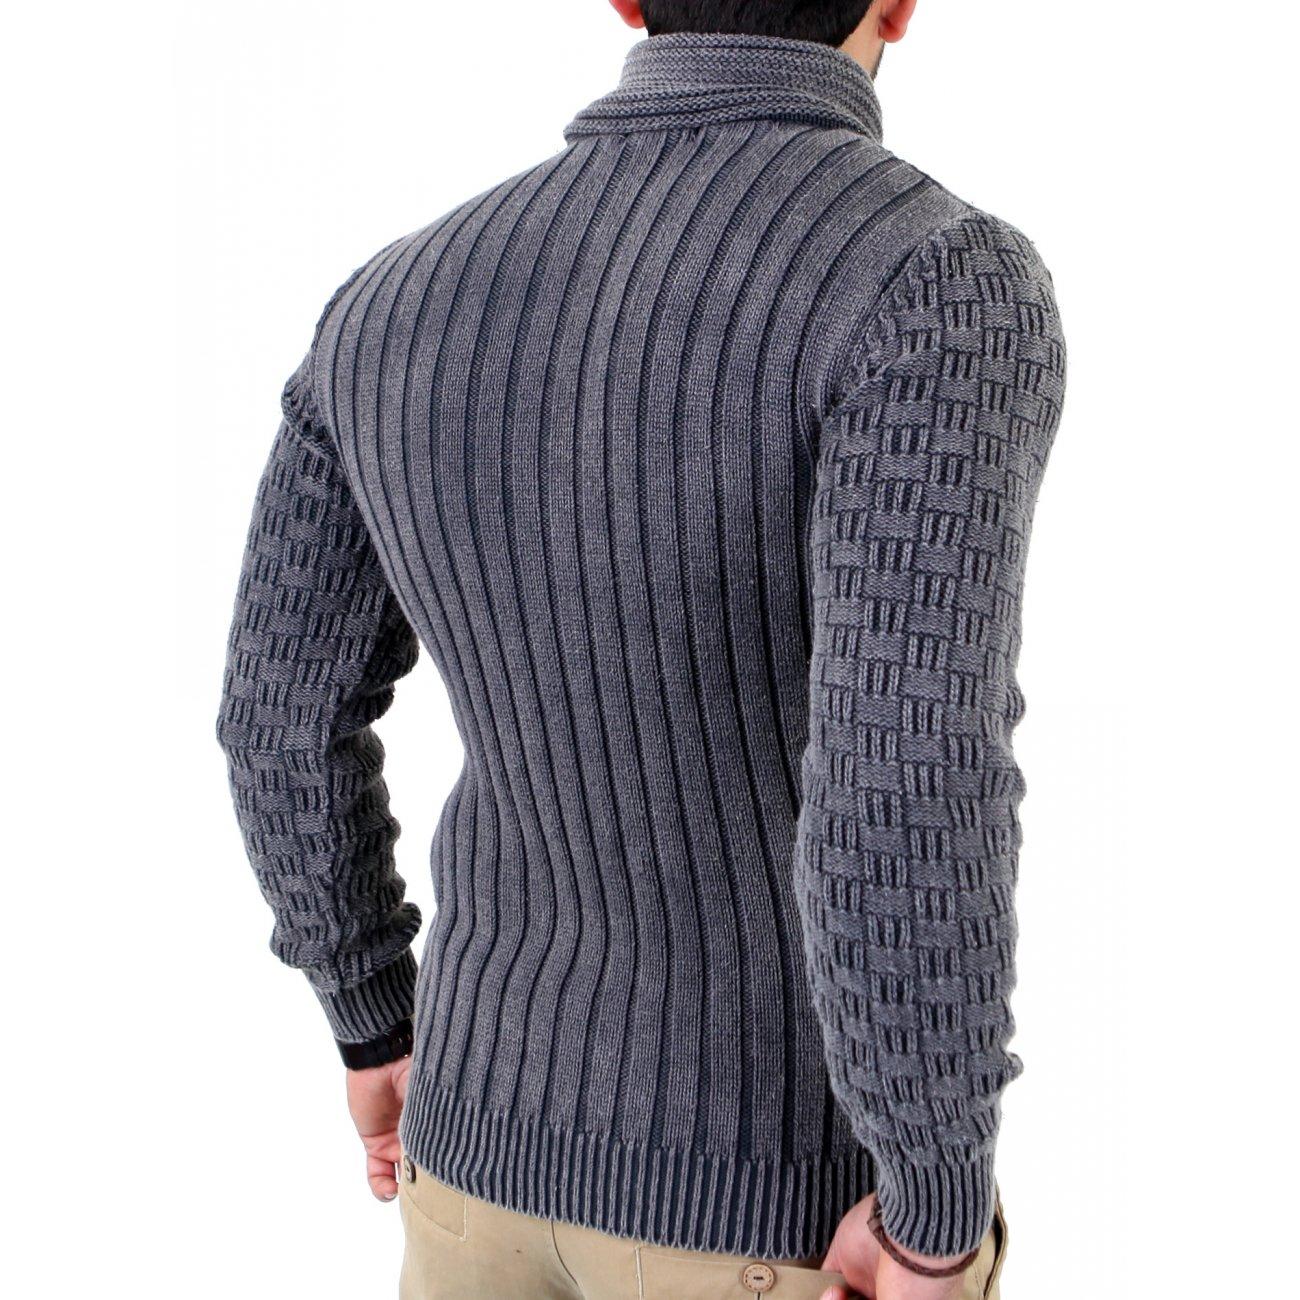 pullover herren tazzio 409 strickpullover herren kaufen. Black Bedroom Furniture Sets. Home Design Ideas